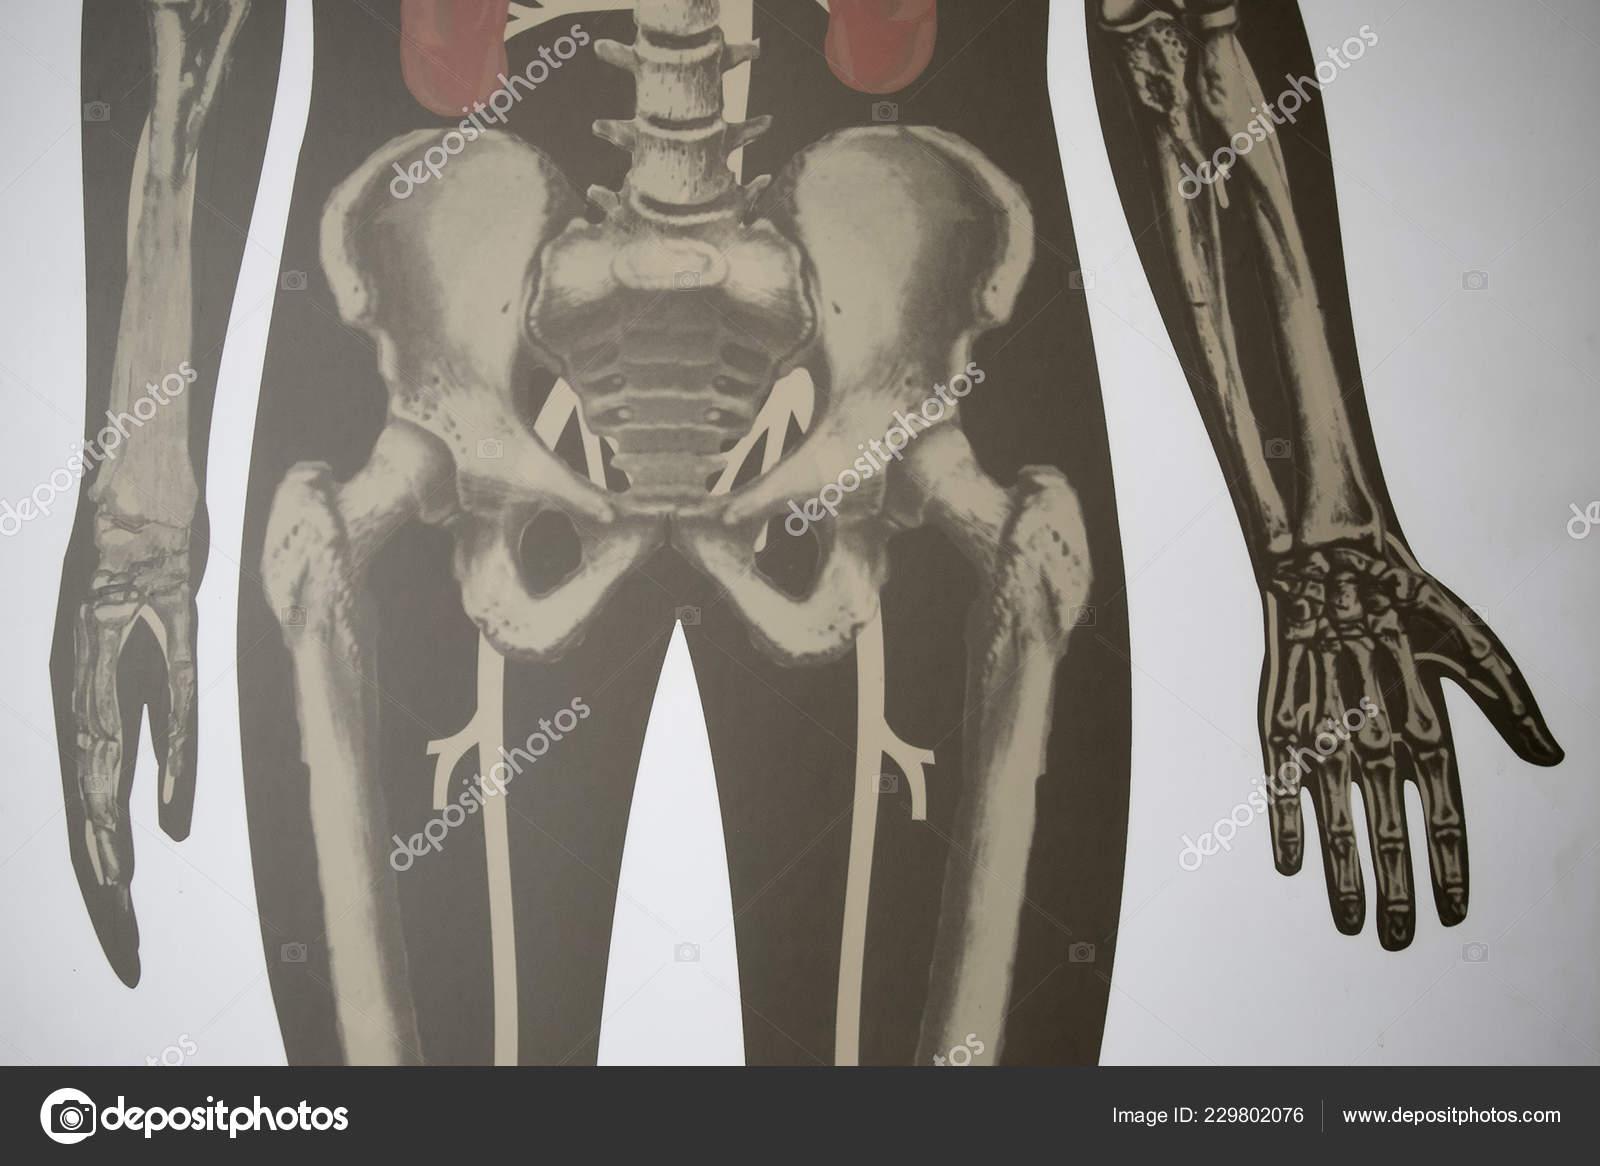 Anatomy Model Internal Organs Human Body Use Medical Education